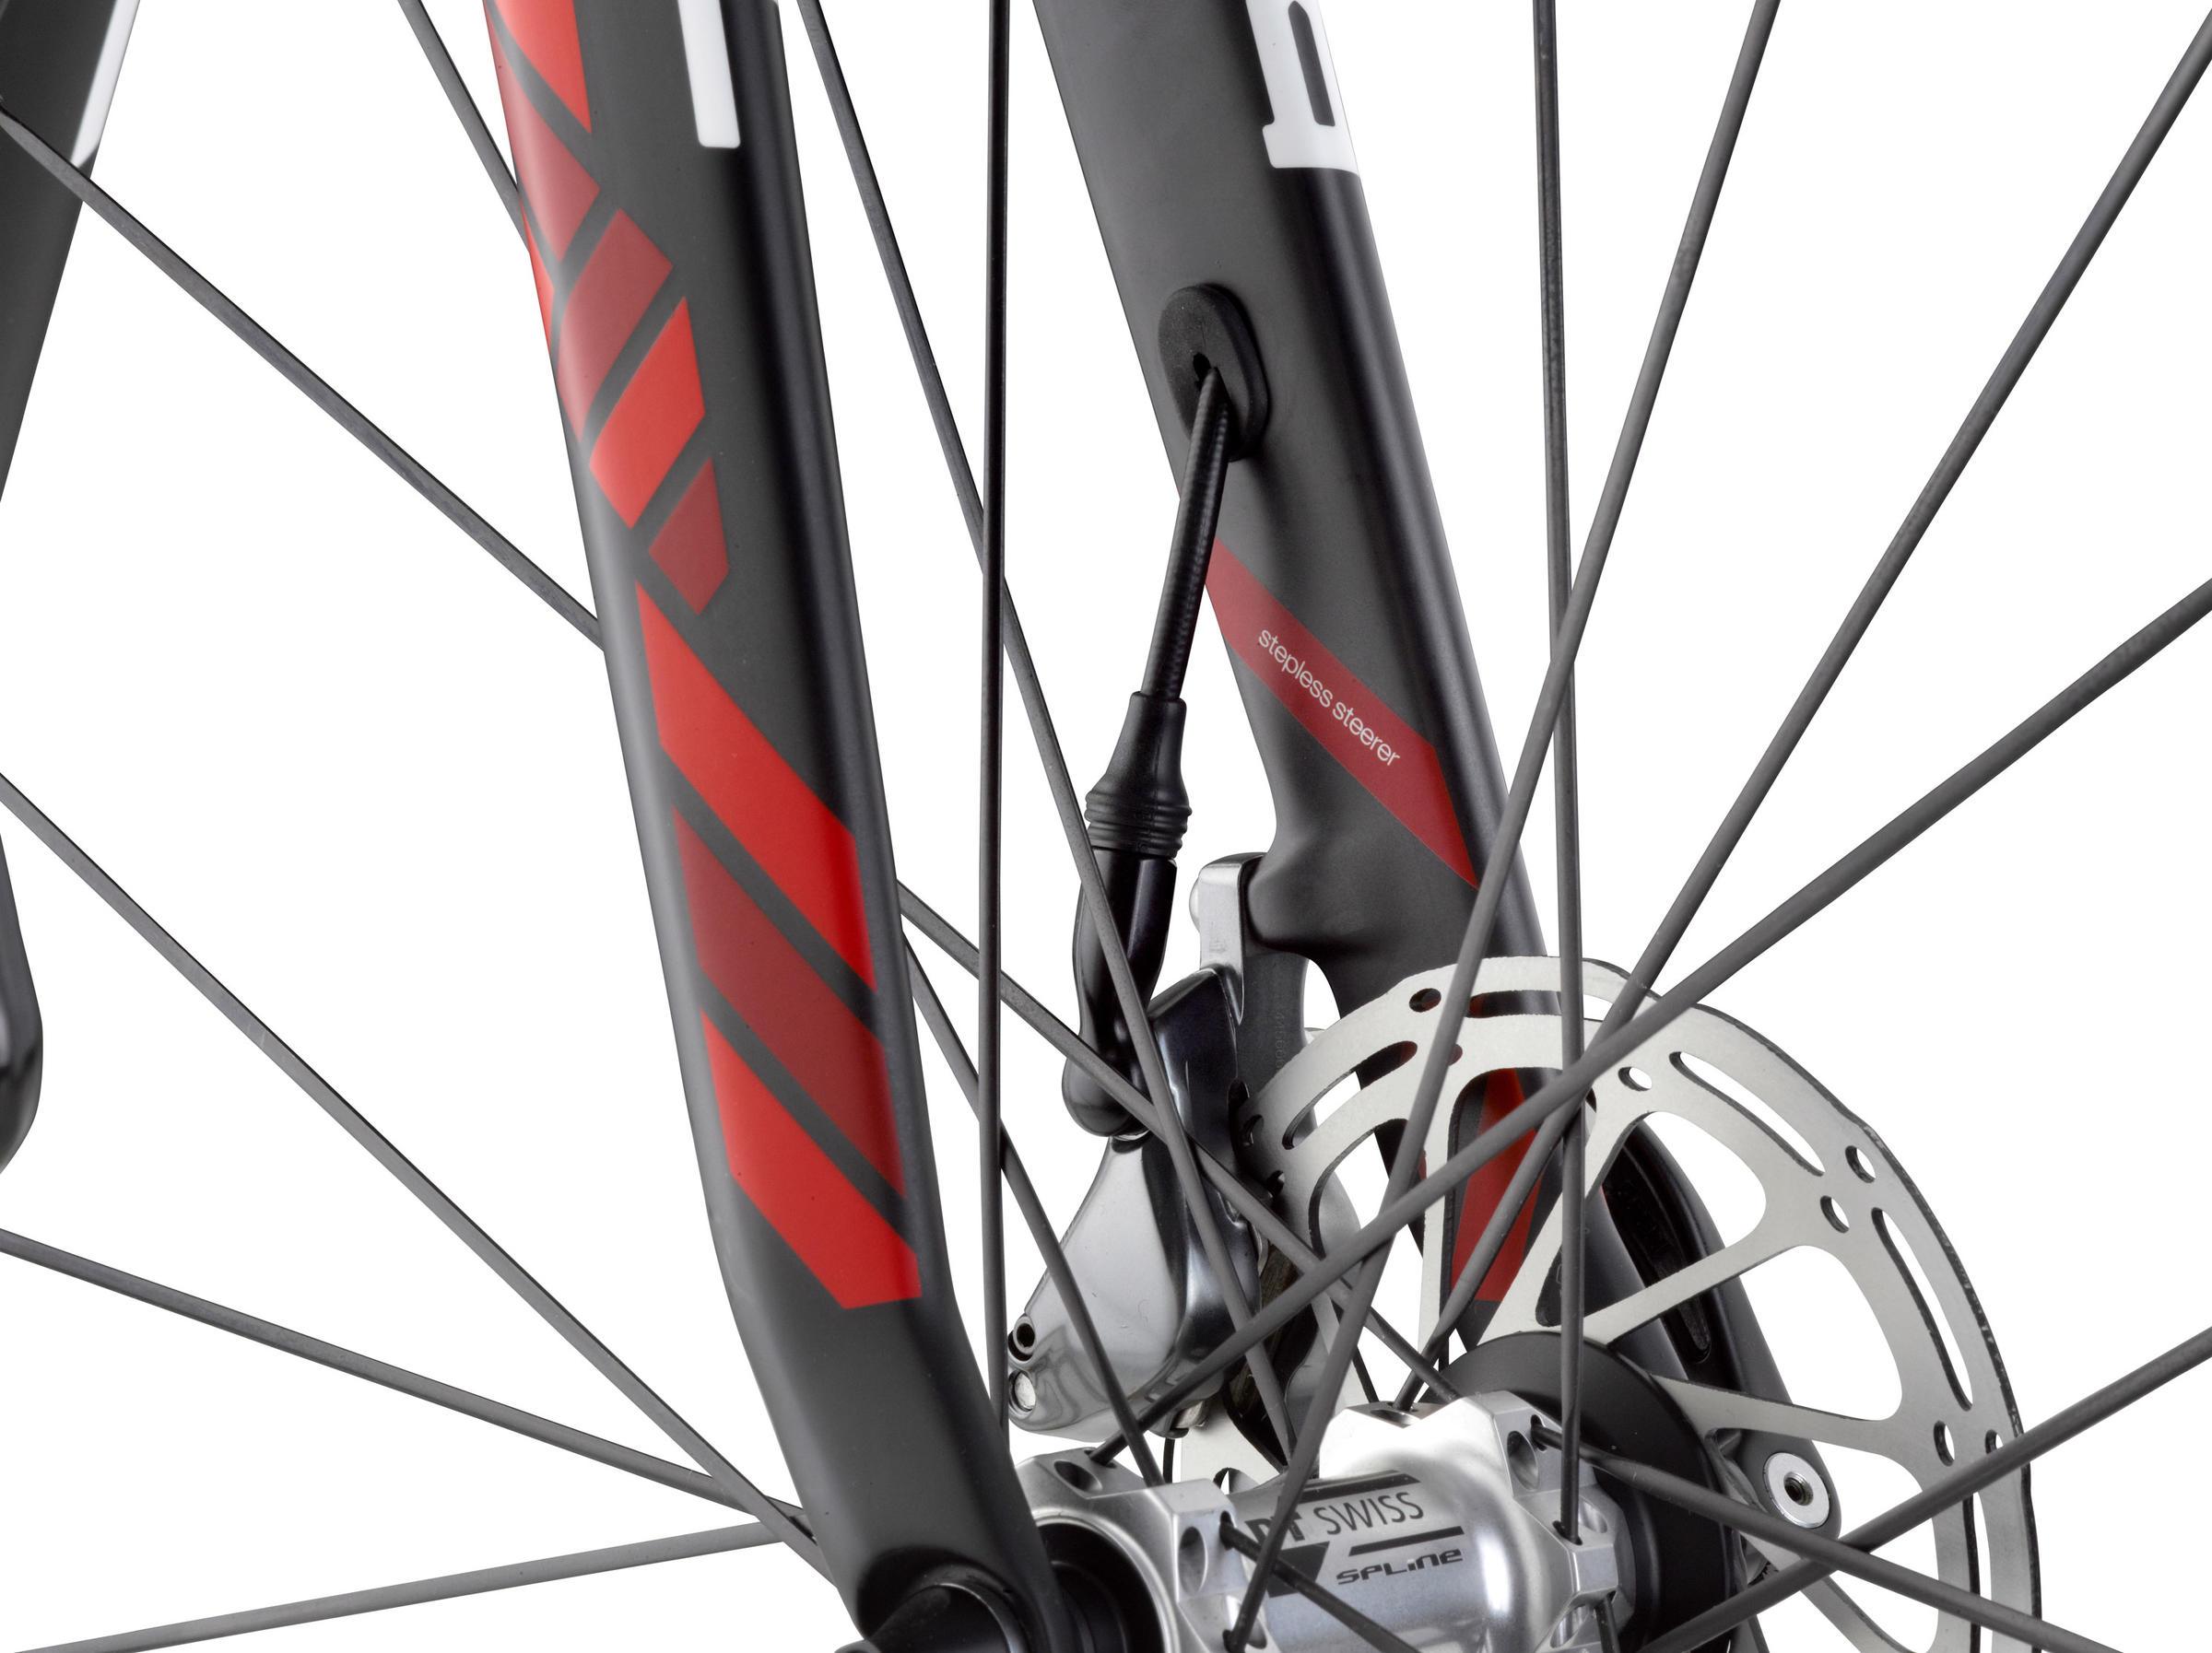 Bmc Crossmachine Cx01 Frameset The Velo Shop Macungie Pa Bike Store